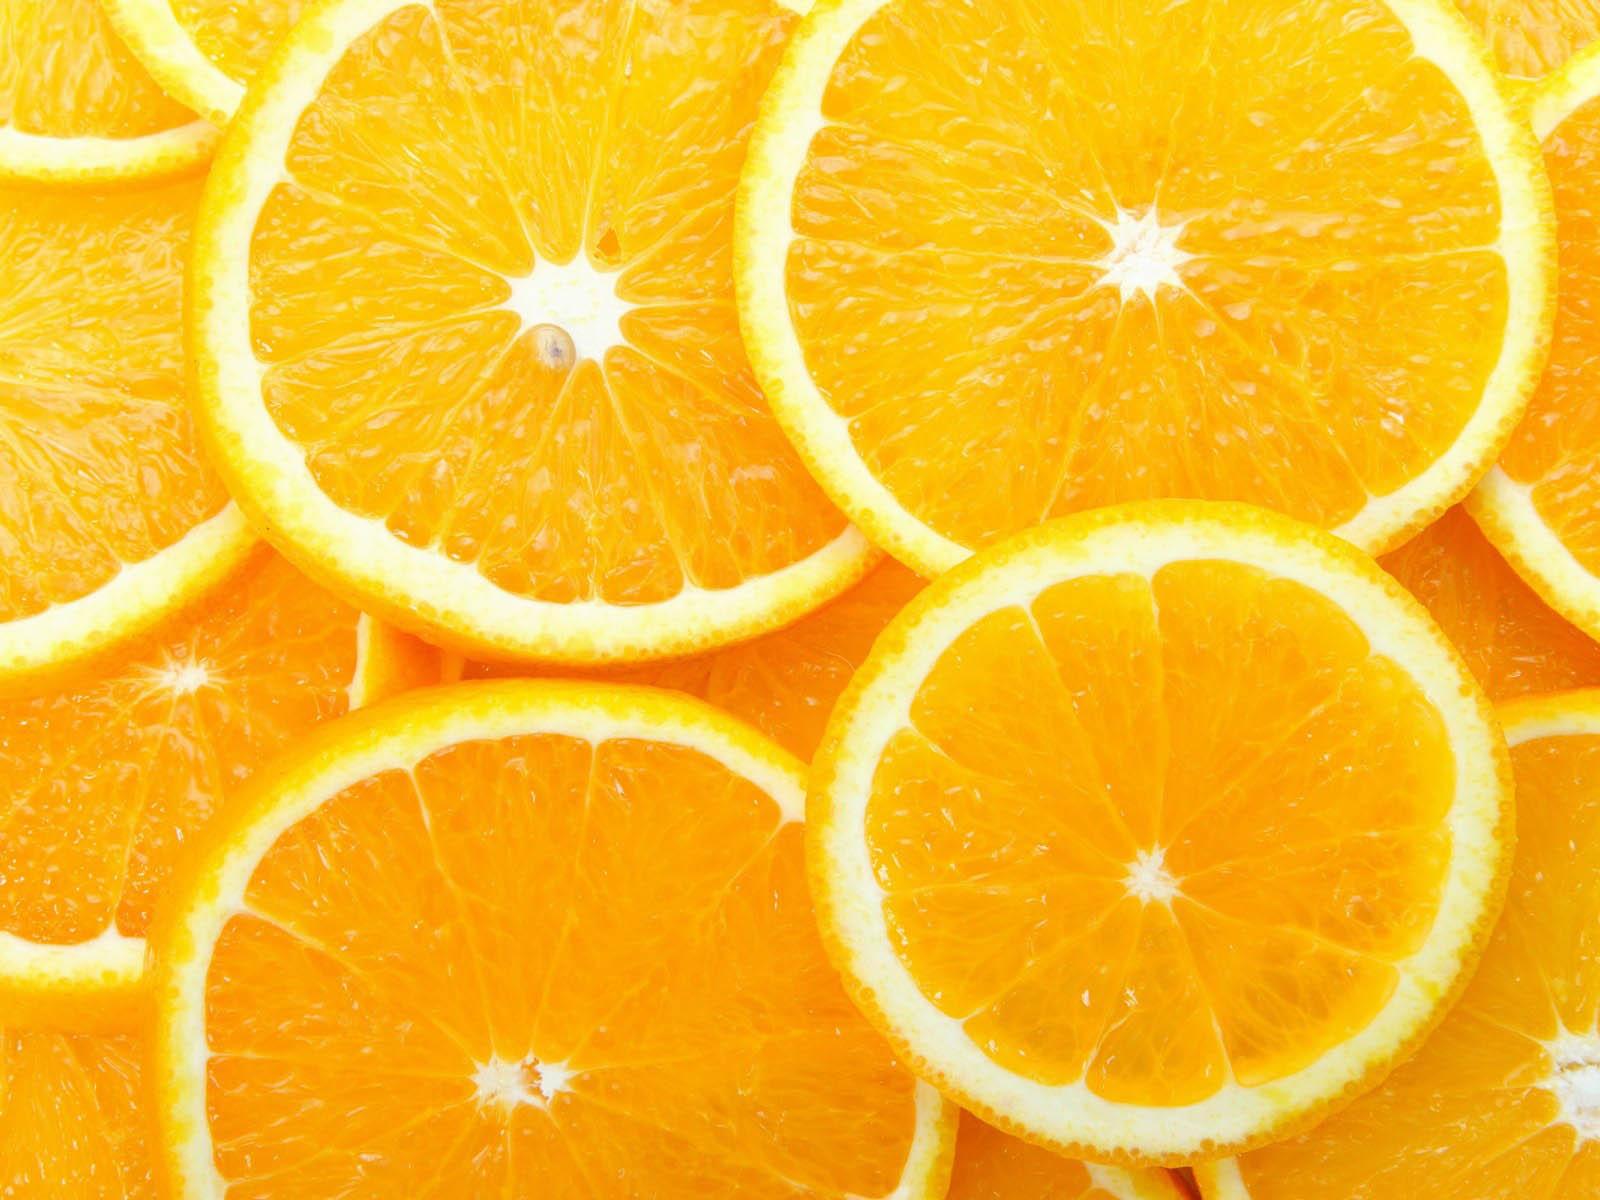 wallpapers: Orange Fruits Wallpapers  wallpapers: Ora...